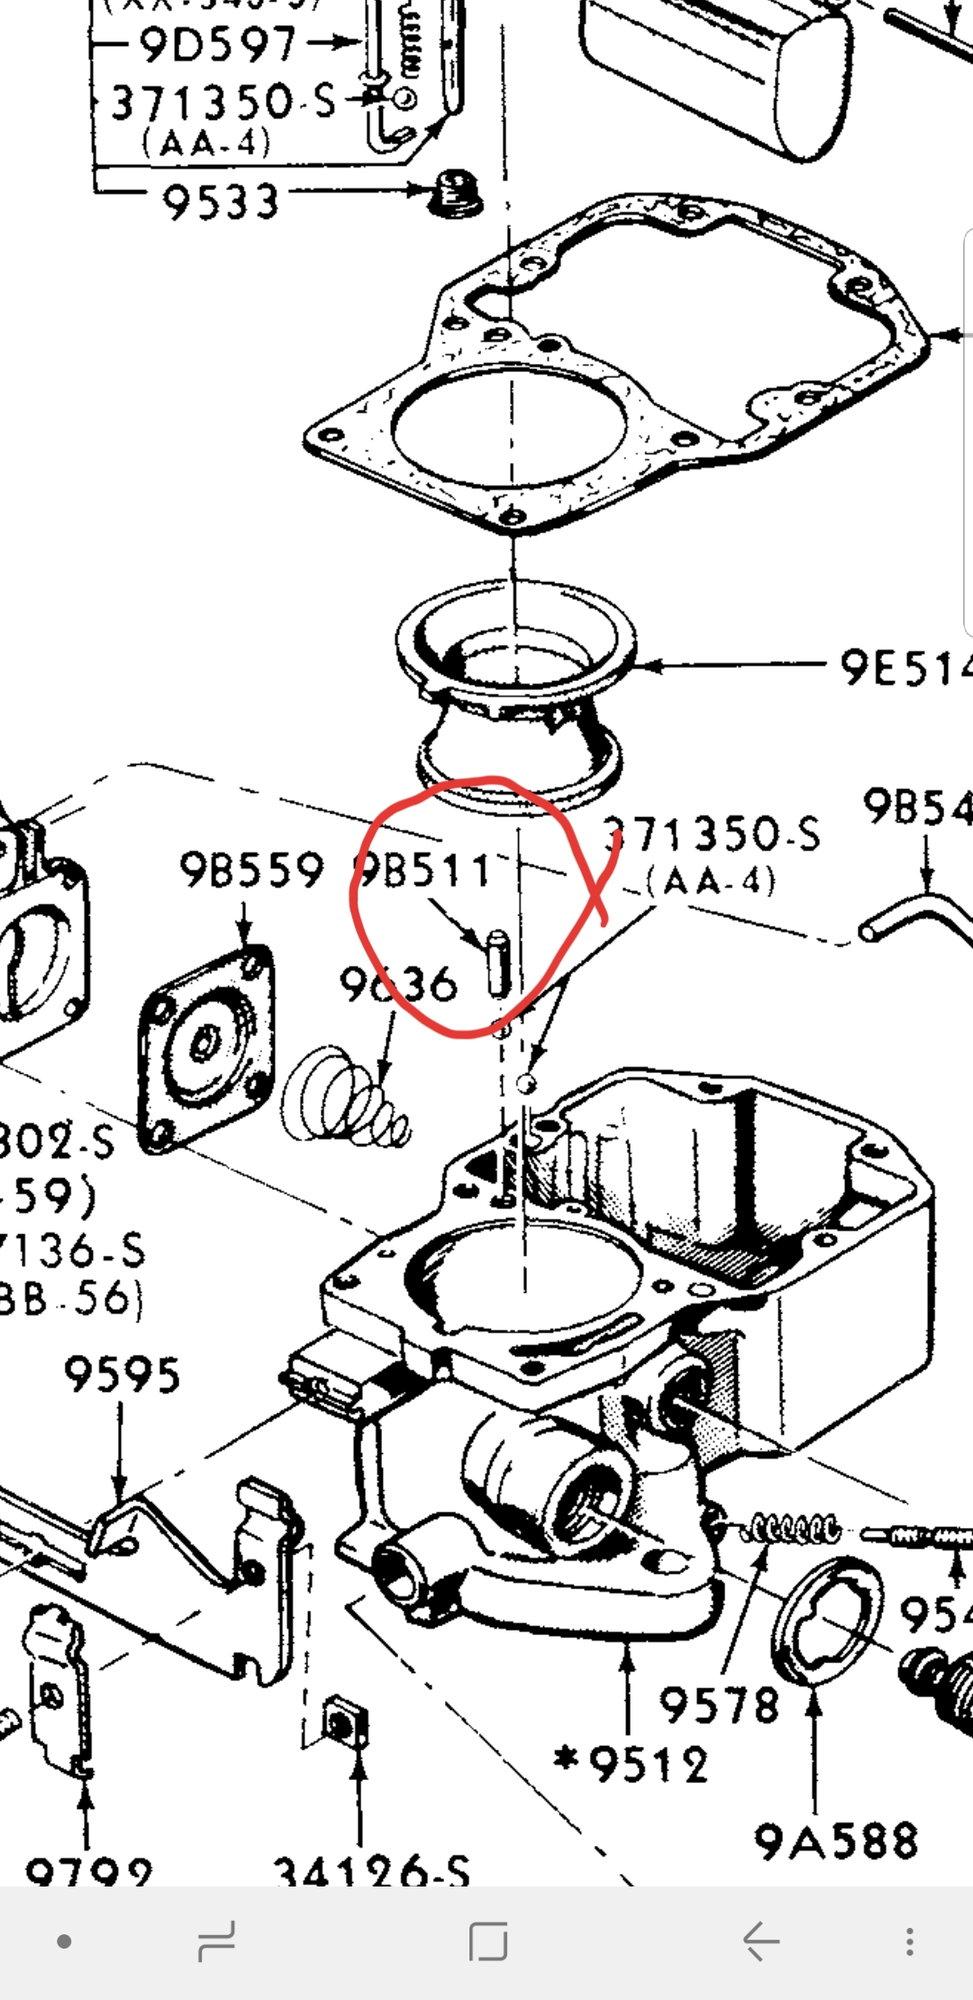 hight resolution of quadrajet parts diagram wiring diagrams the quadrajet parts diagram